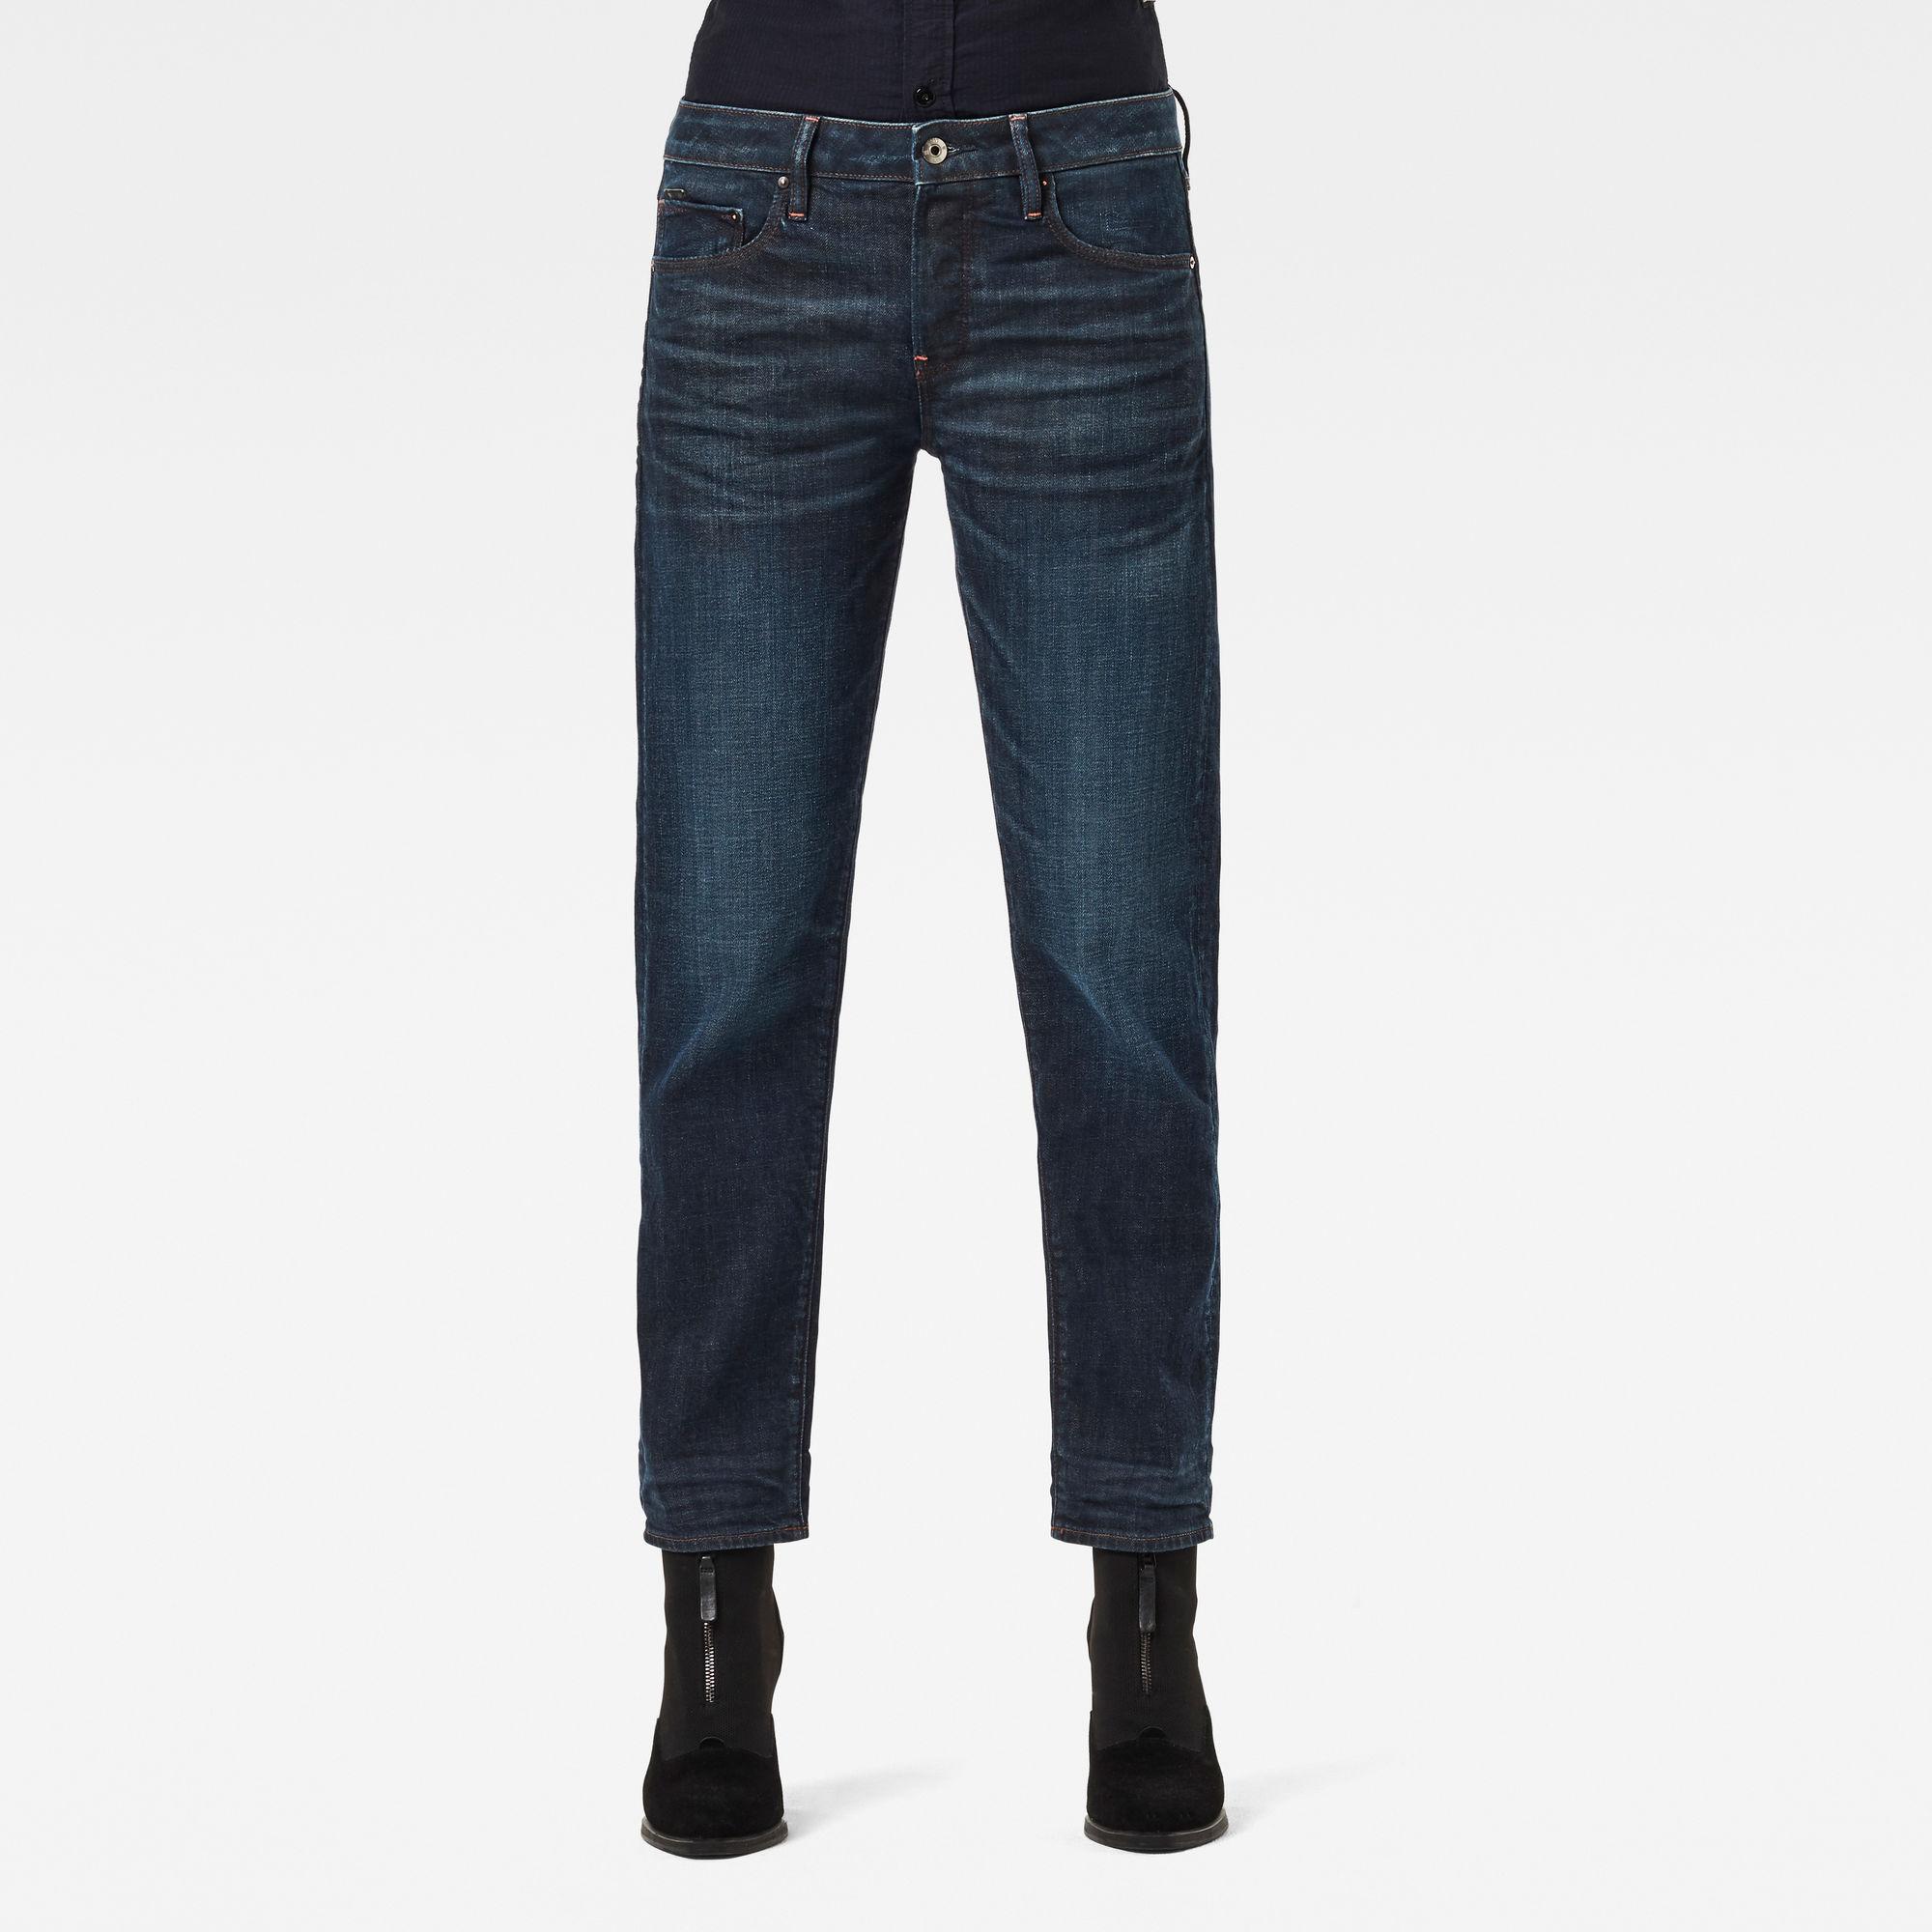 G-Star RAW Dames Kate Boyfriend Jeans C Donkerblauw